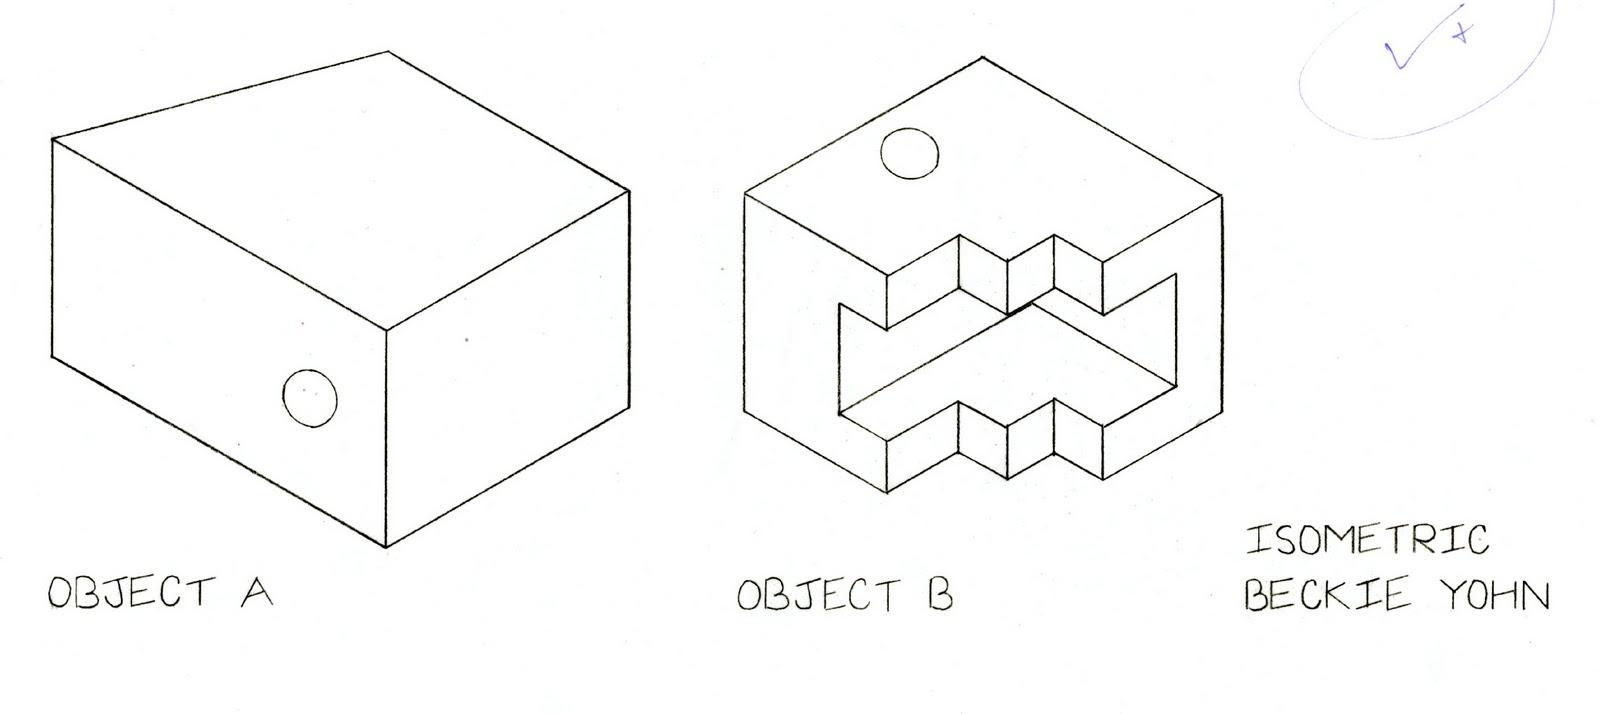 bnykllr: Object A & B (Isometric)